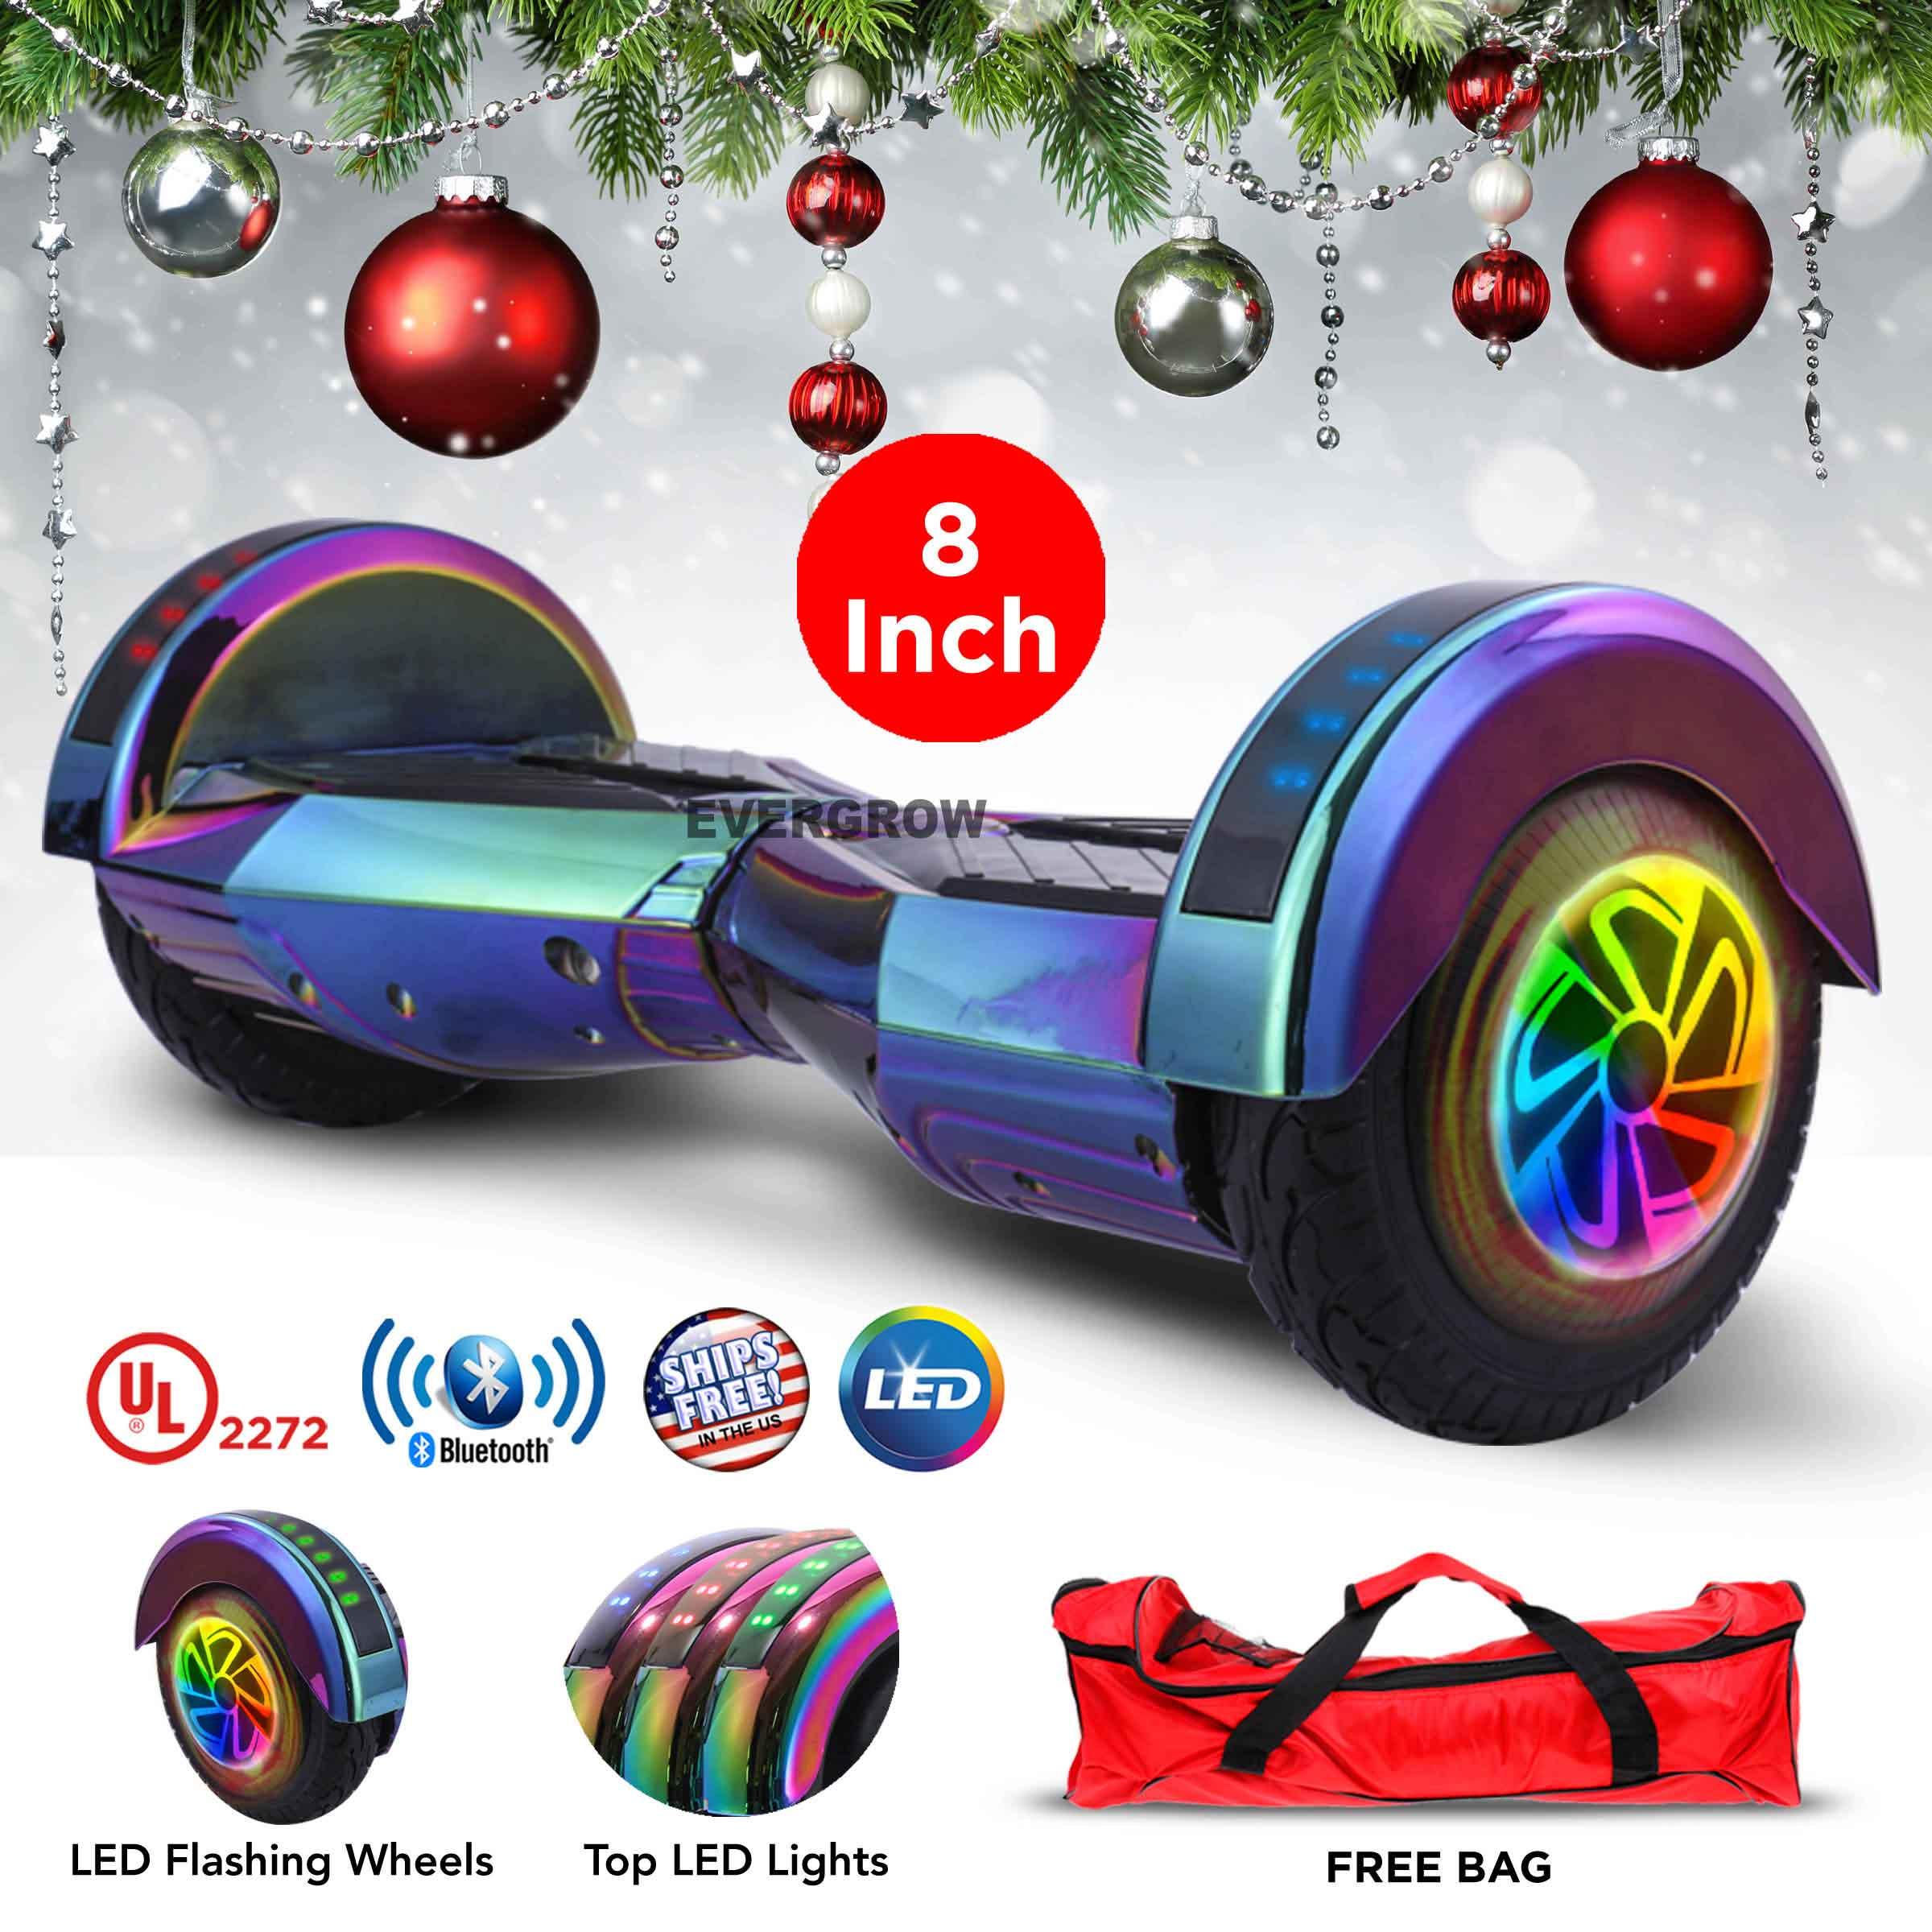 8 inch Chrome Rainbow Hoverboard Bluetooth Smart Self Balancing Electric Board (WHEELS-WC8-RAINBOW-CHROME)